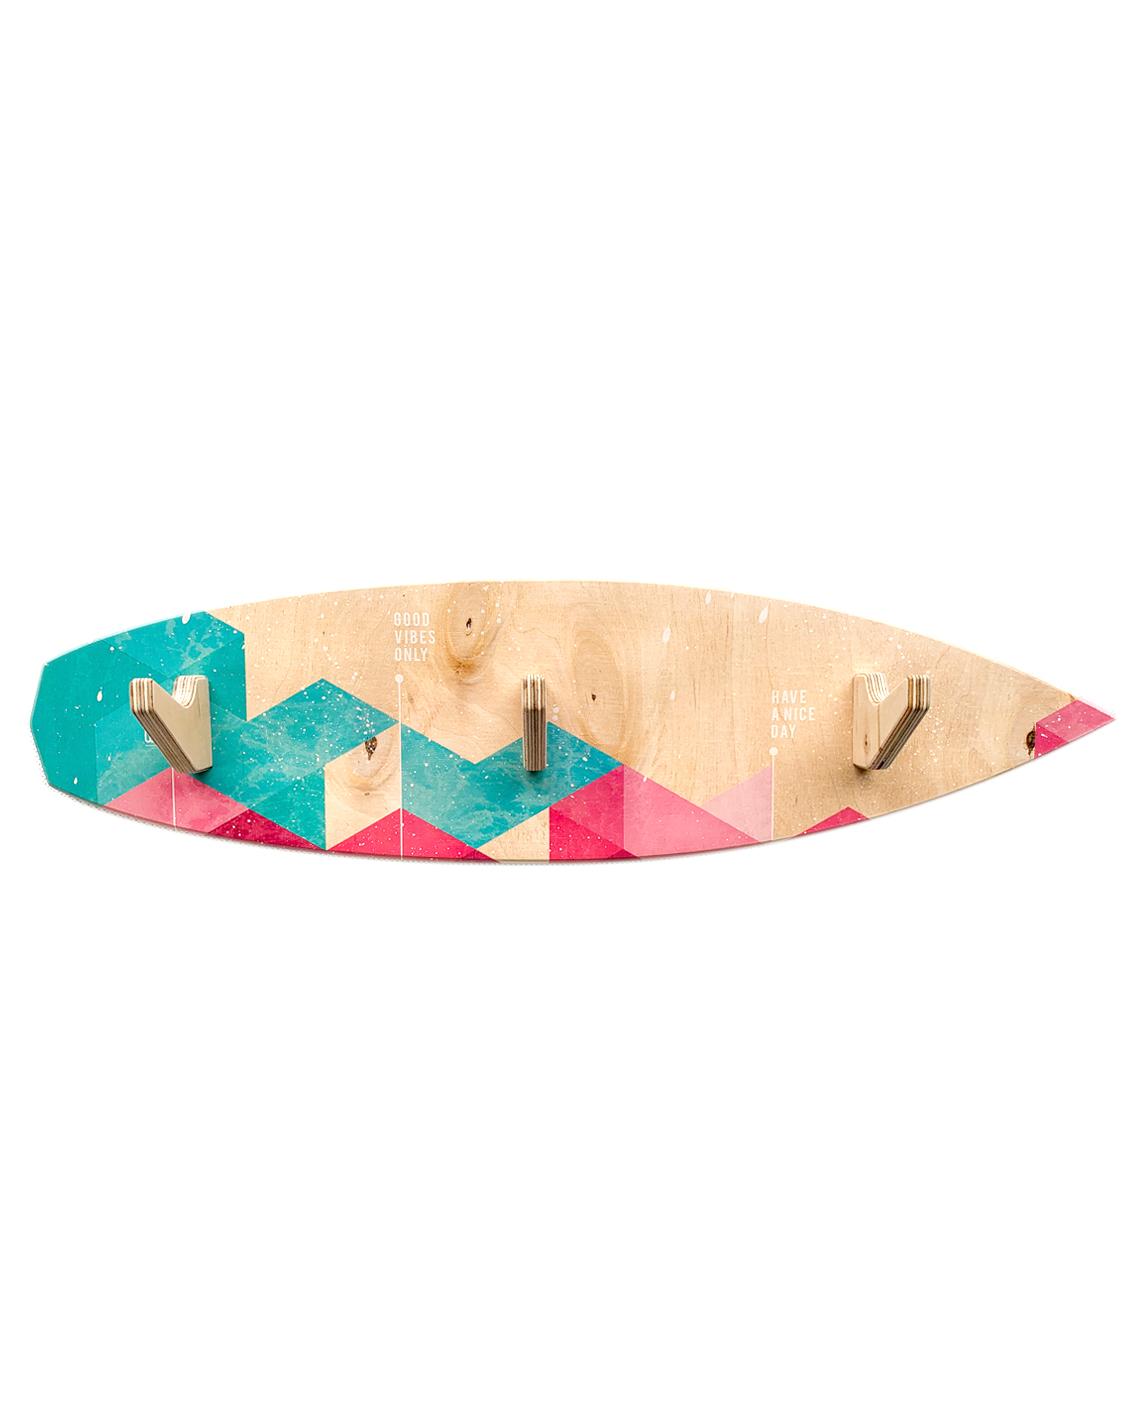 wieszak_surf_surfGood